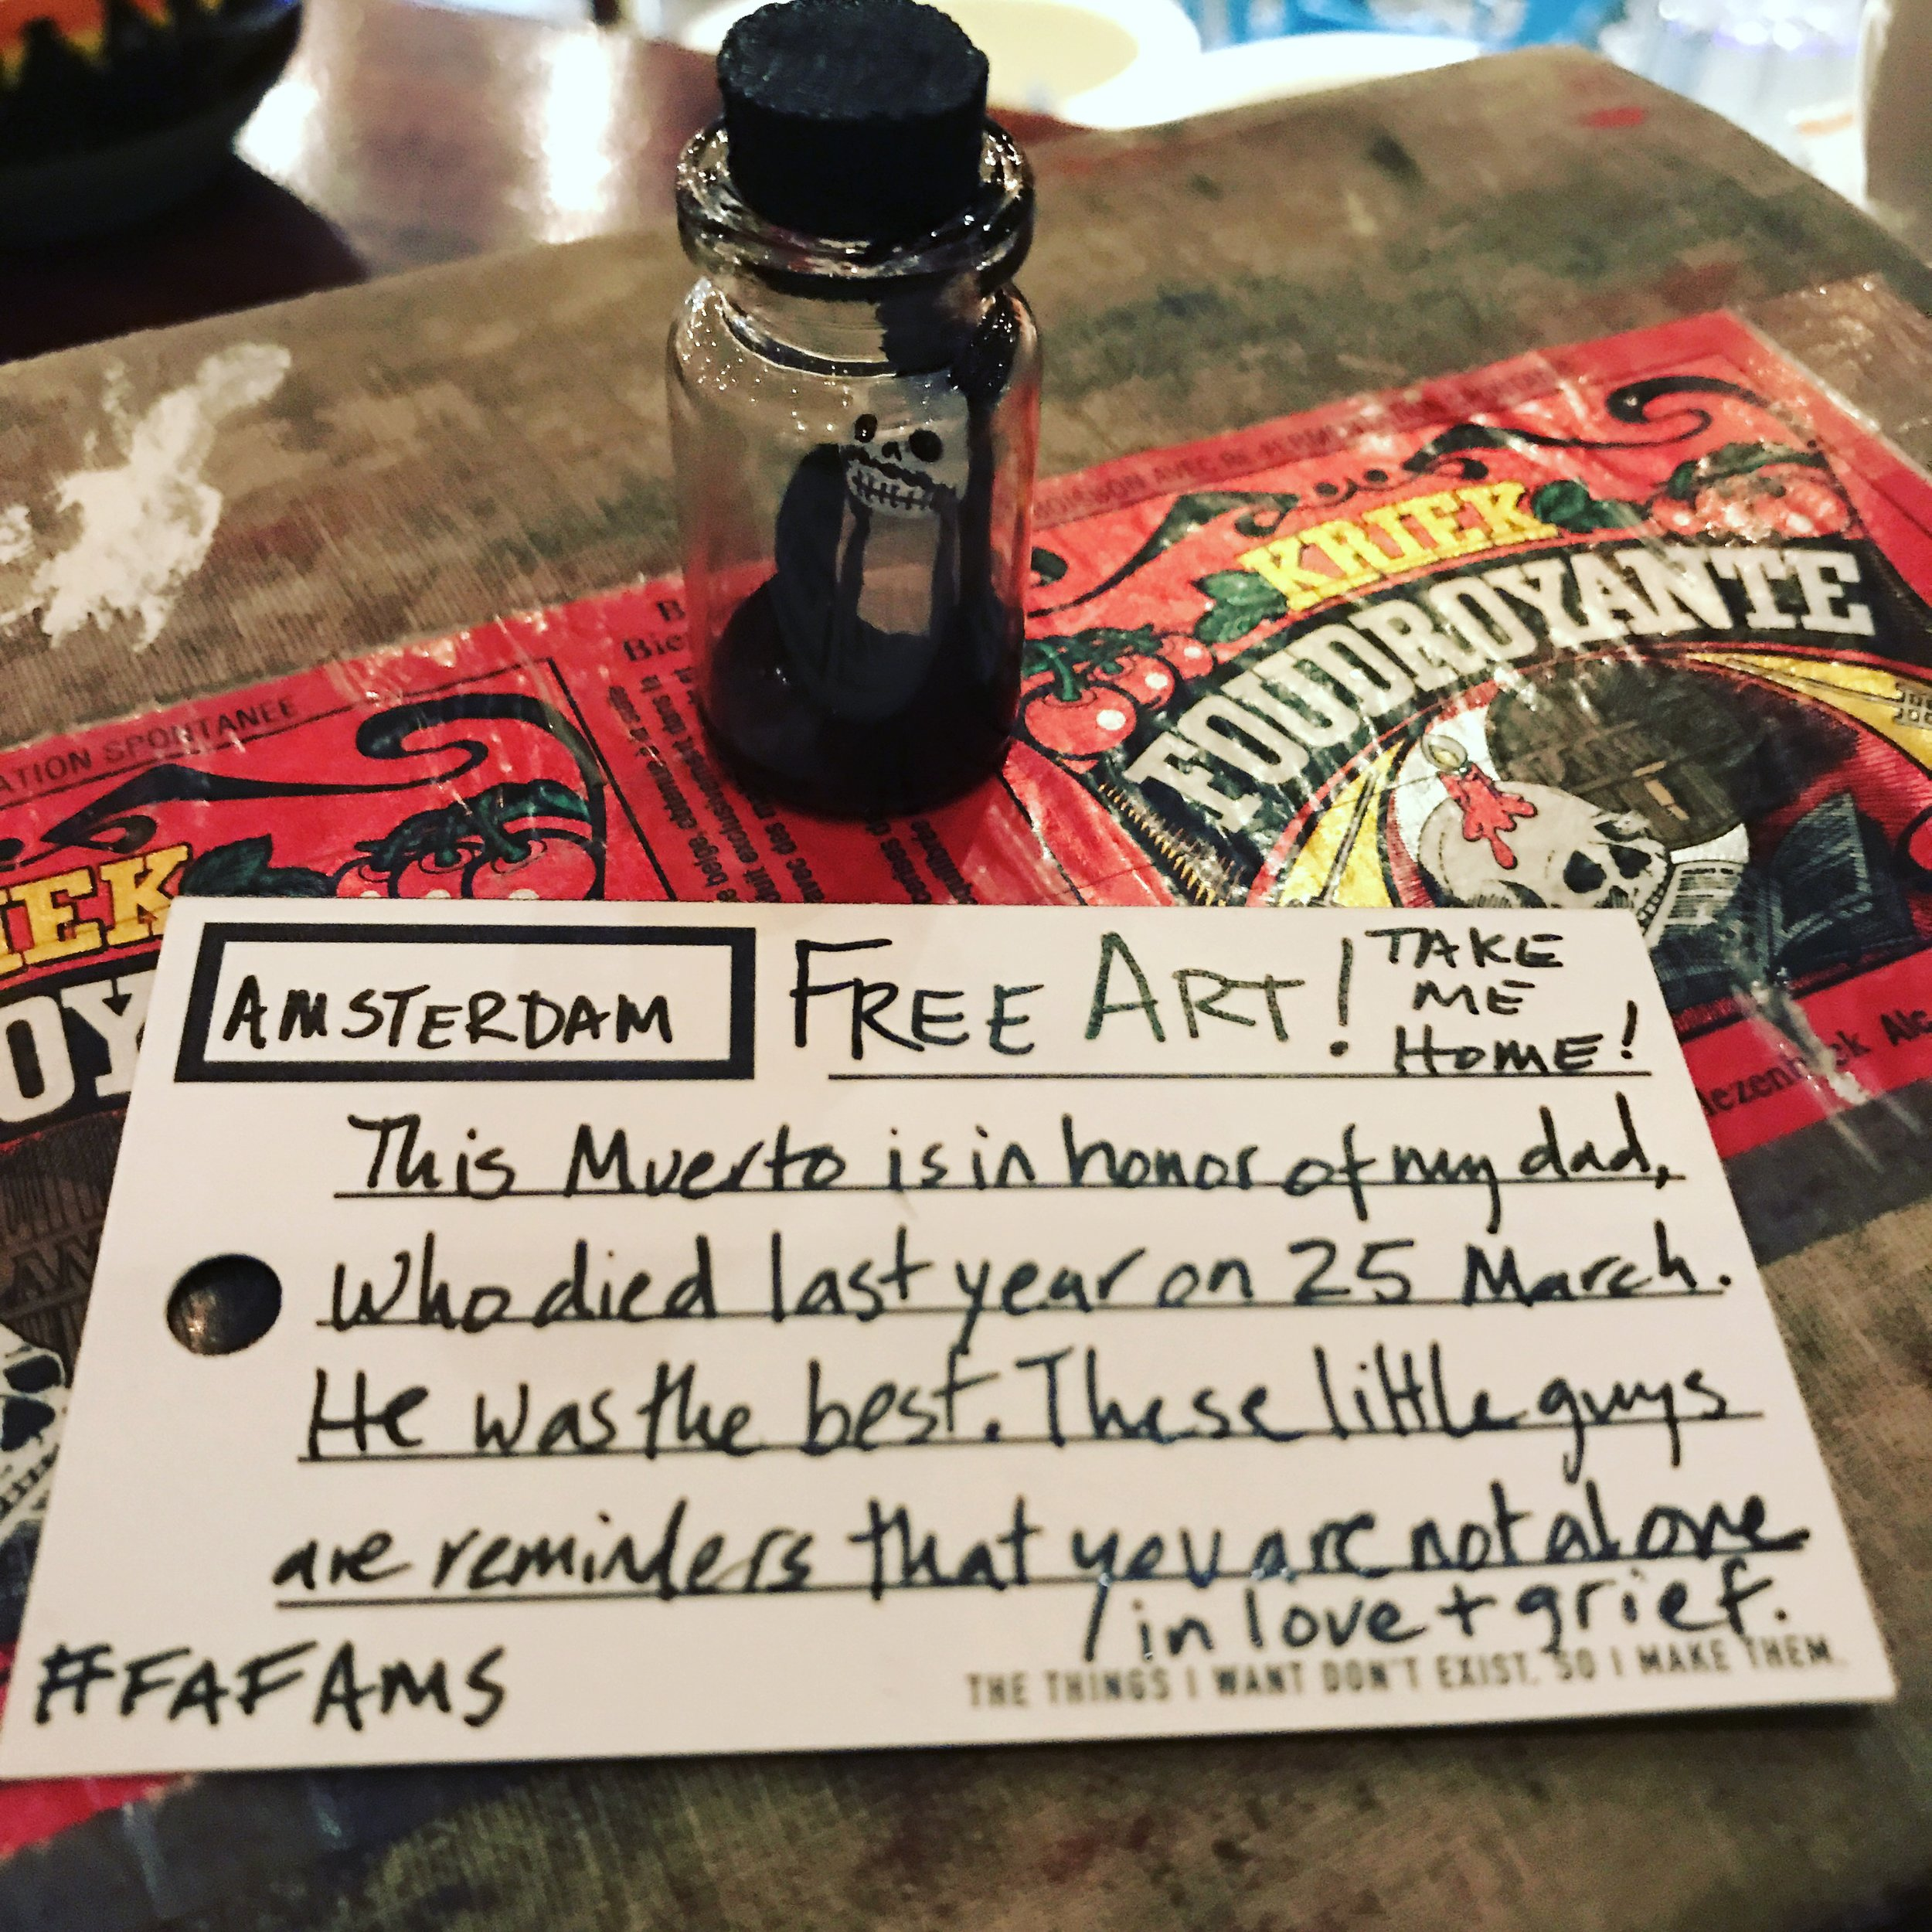 The message of Muertos